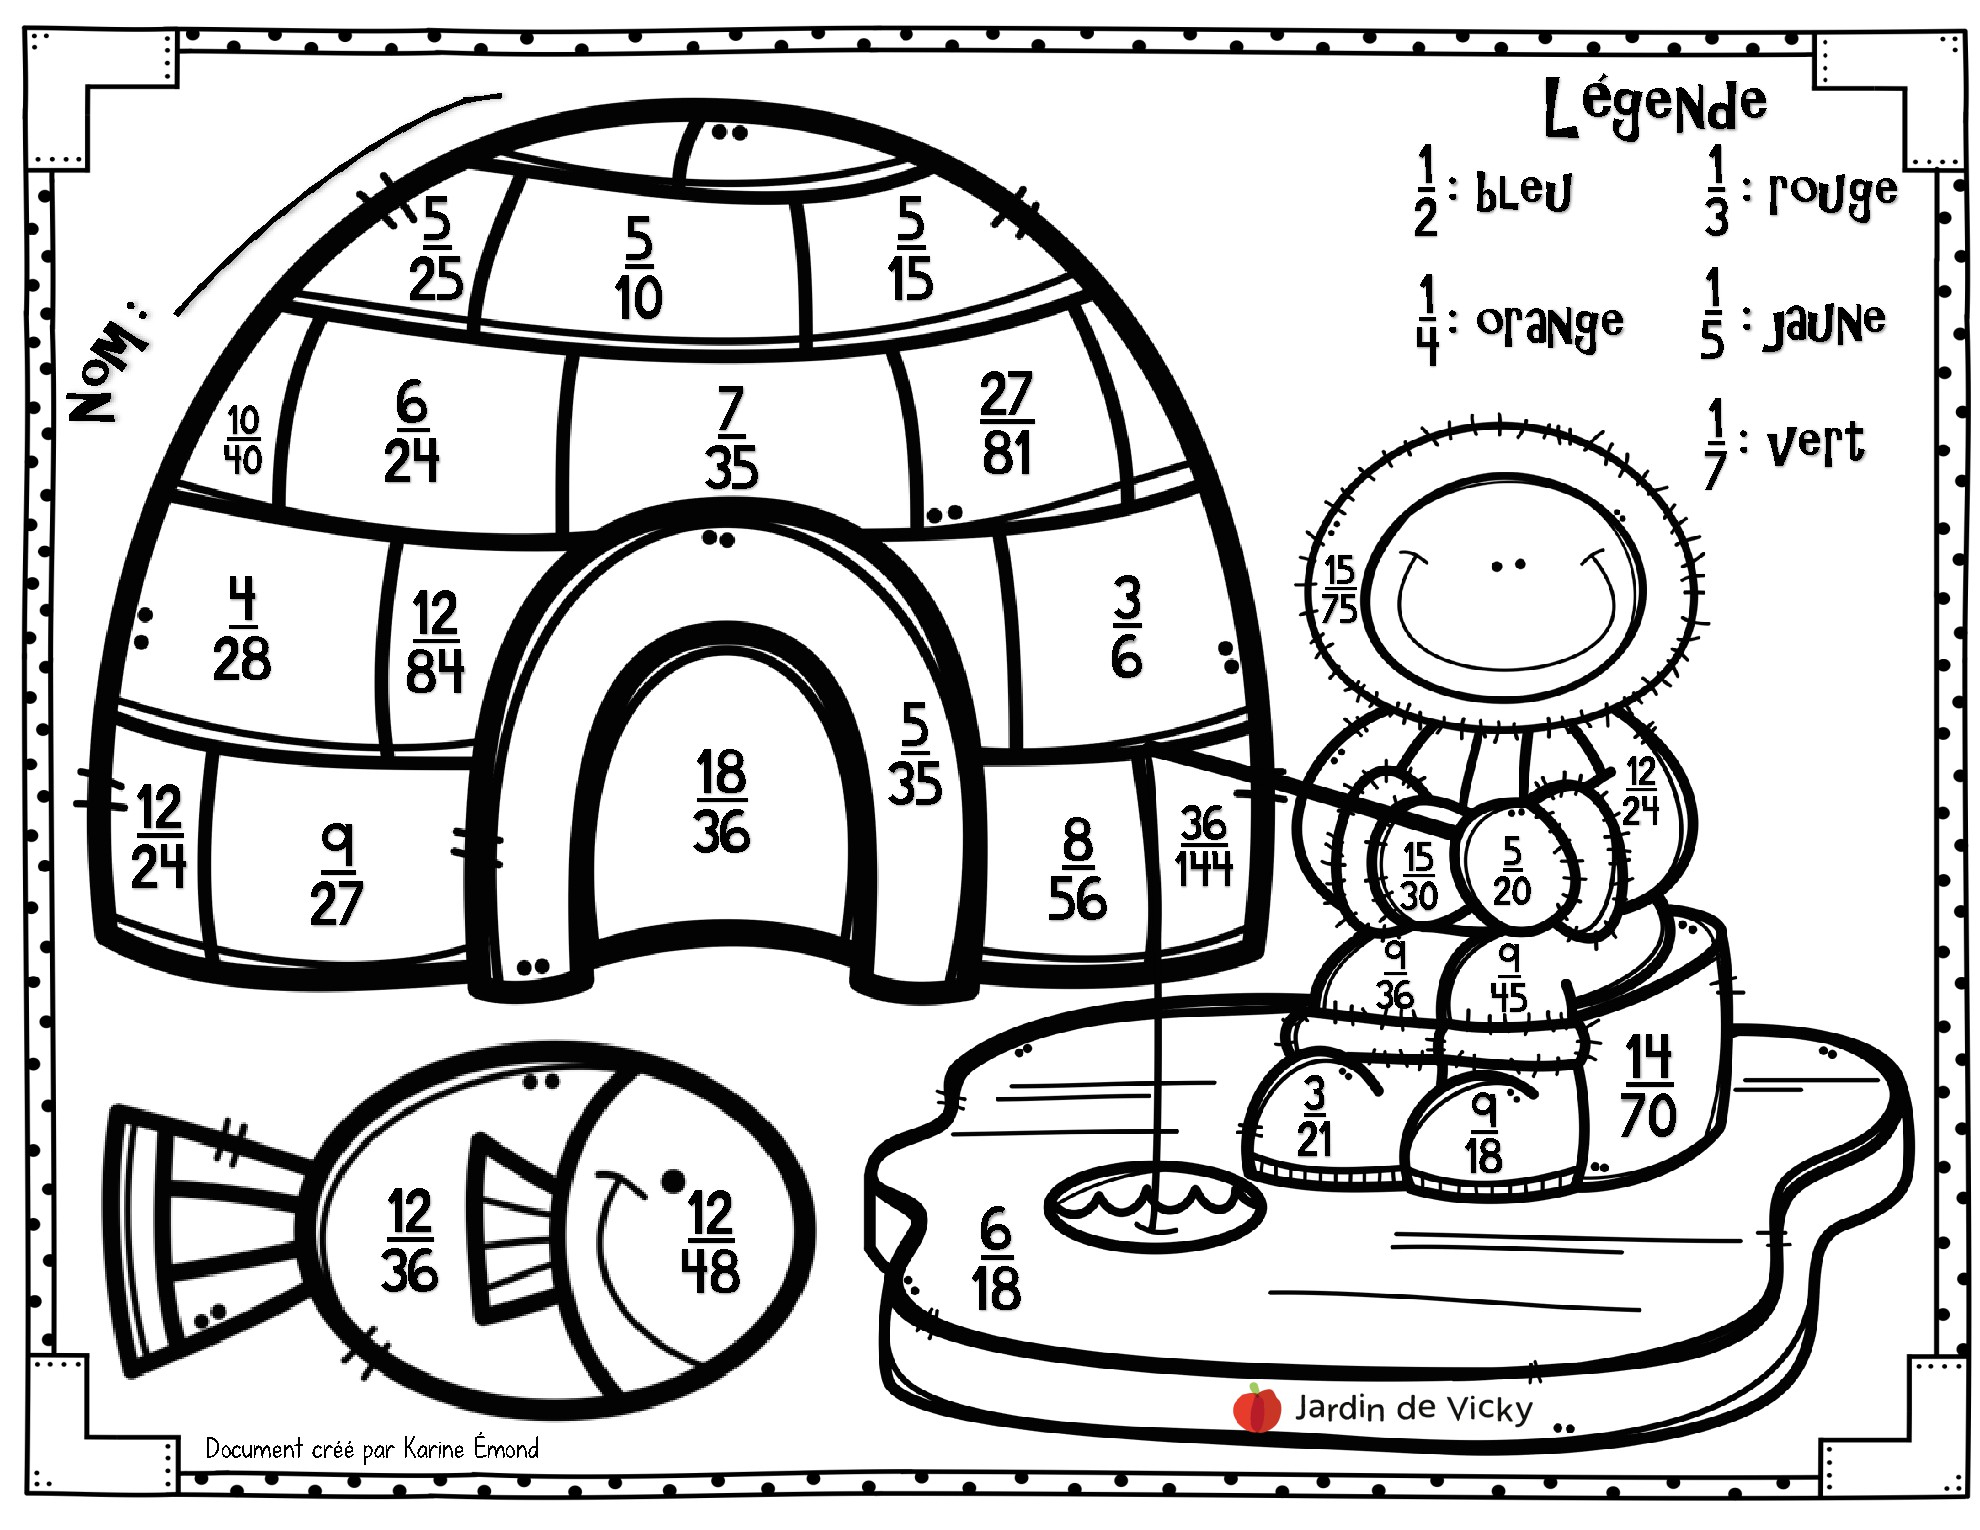 L'igloo Des Fractions Irréductibles | Jardin De Vicky tout Coloriage Igloo